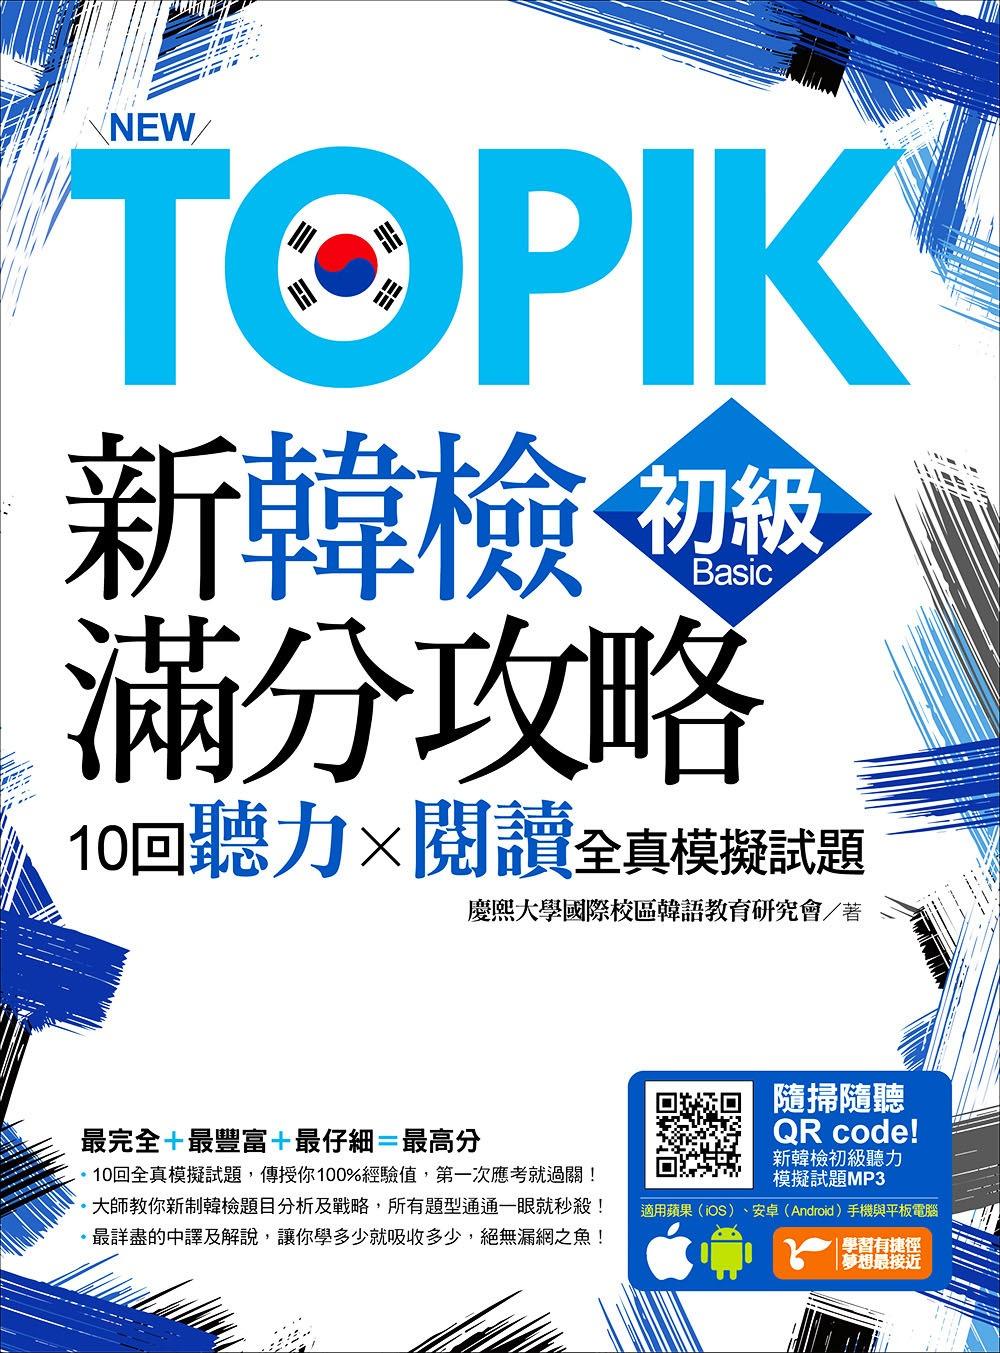 New TOPIK新韓檢初級滿分攻略:10回聽力╳閱讀全真模擬試題(附隨掃隨聽QR code MP3)